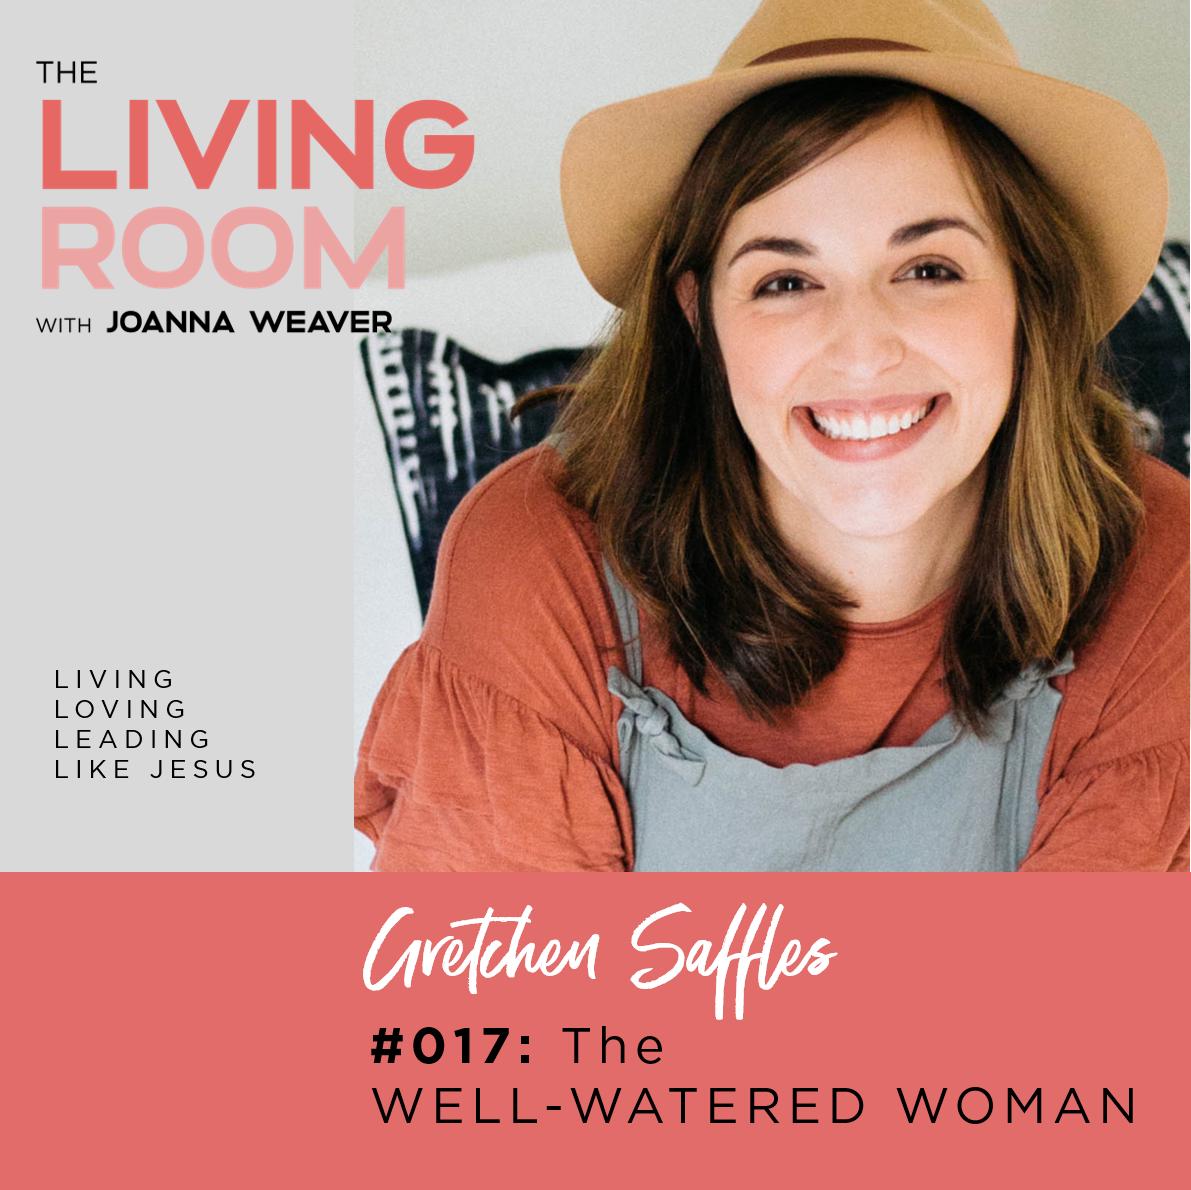 017: The Living Room Podcast - Guest Gretchen Saffles